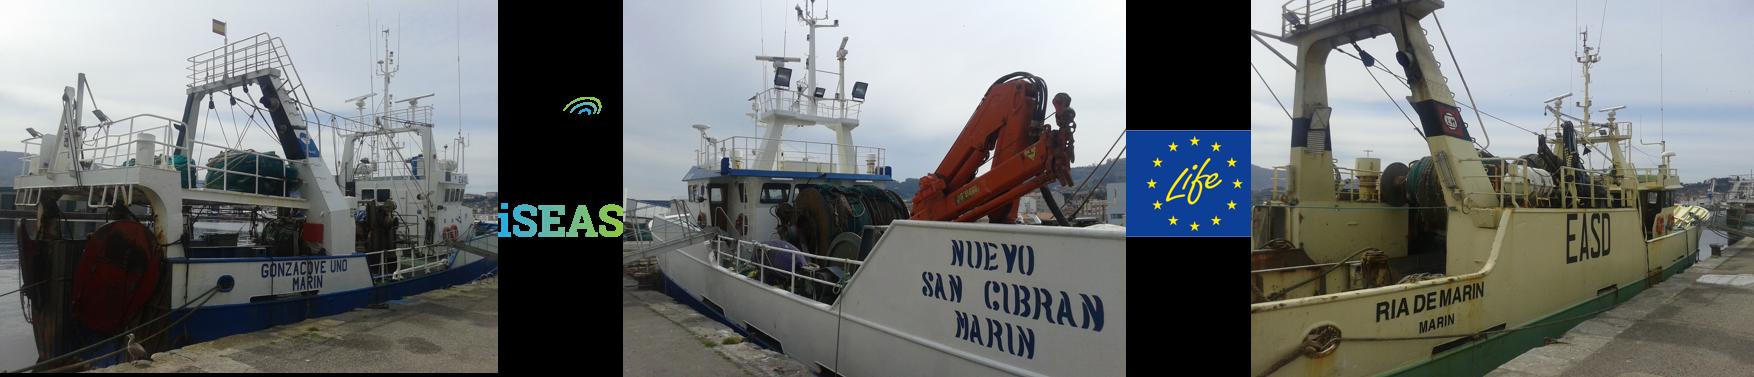 descartes_discards_landing_obligation_fisheries_pesca